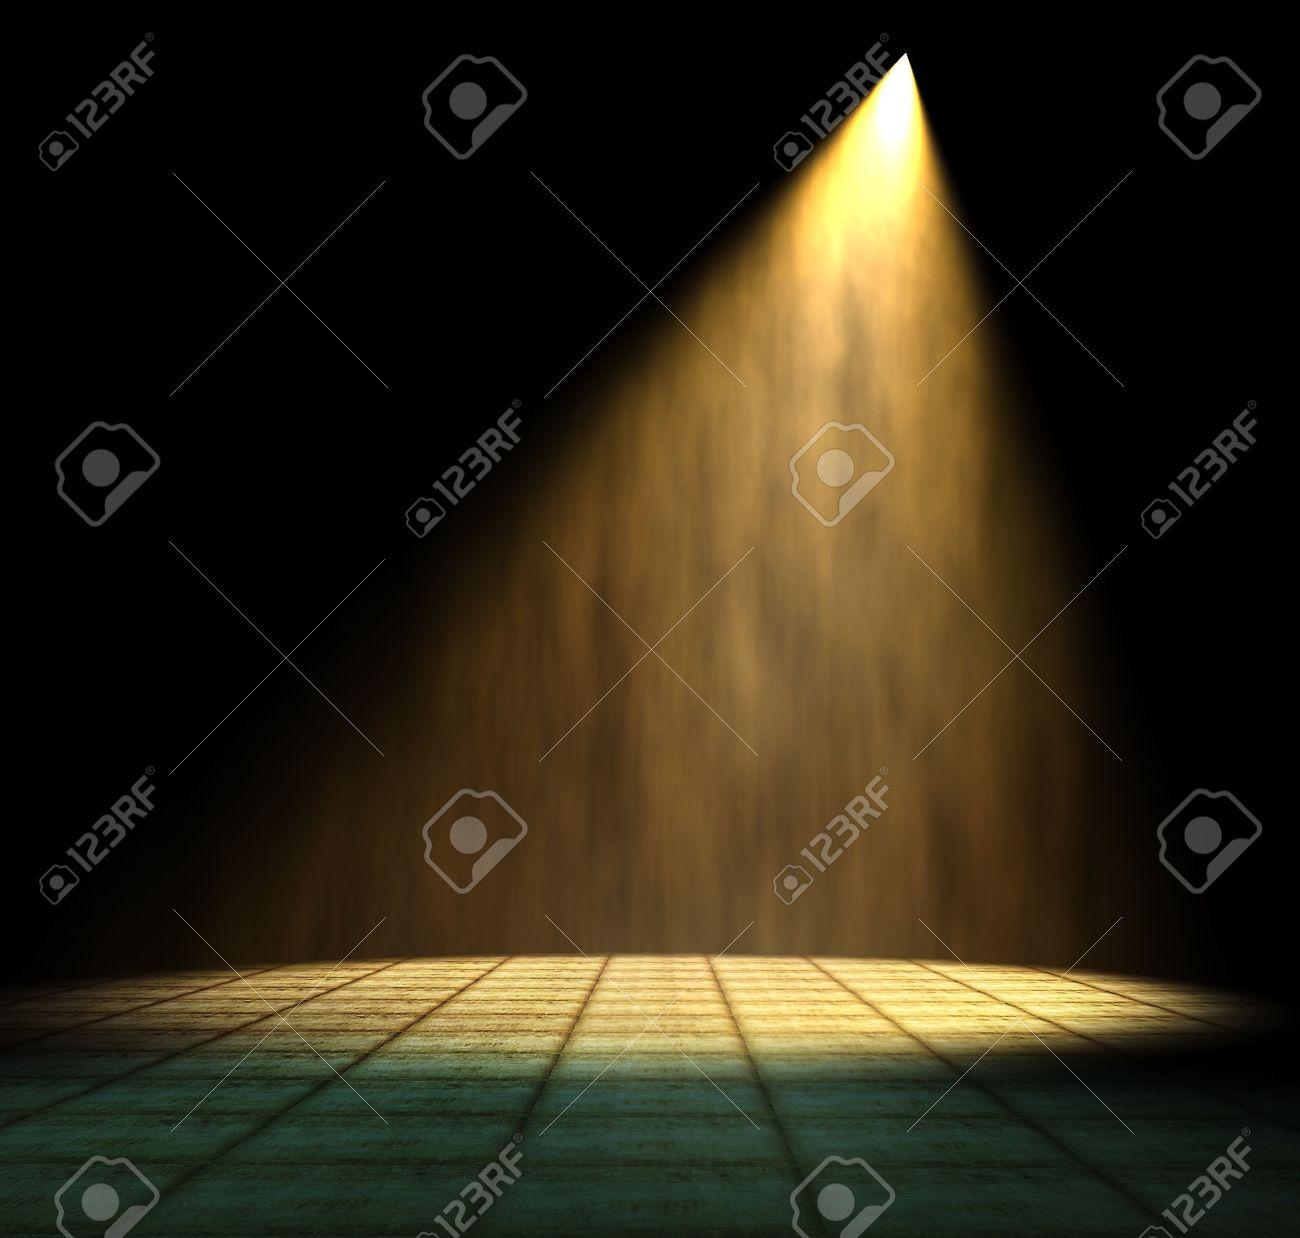 Dark room with light bulb - Light Beam In Dark Room Stock Photo 10265348